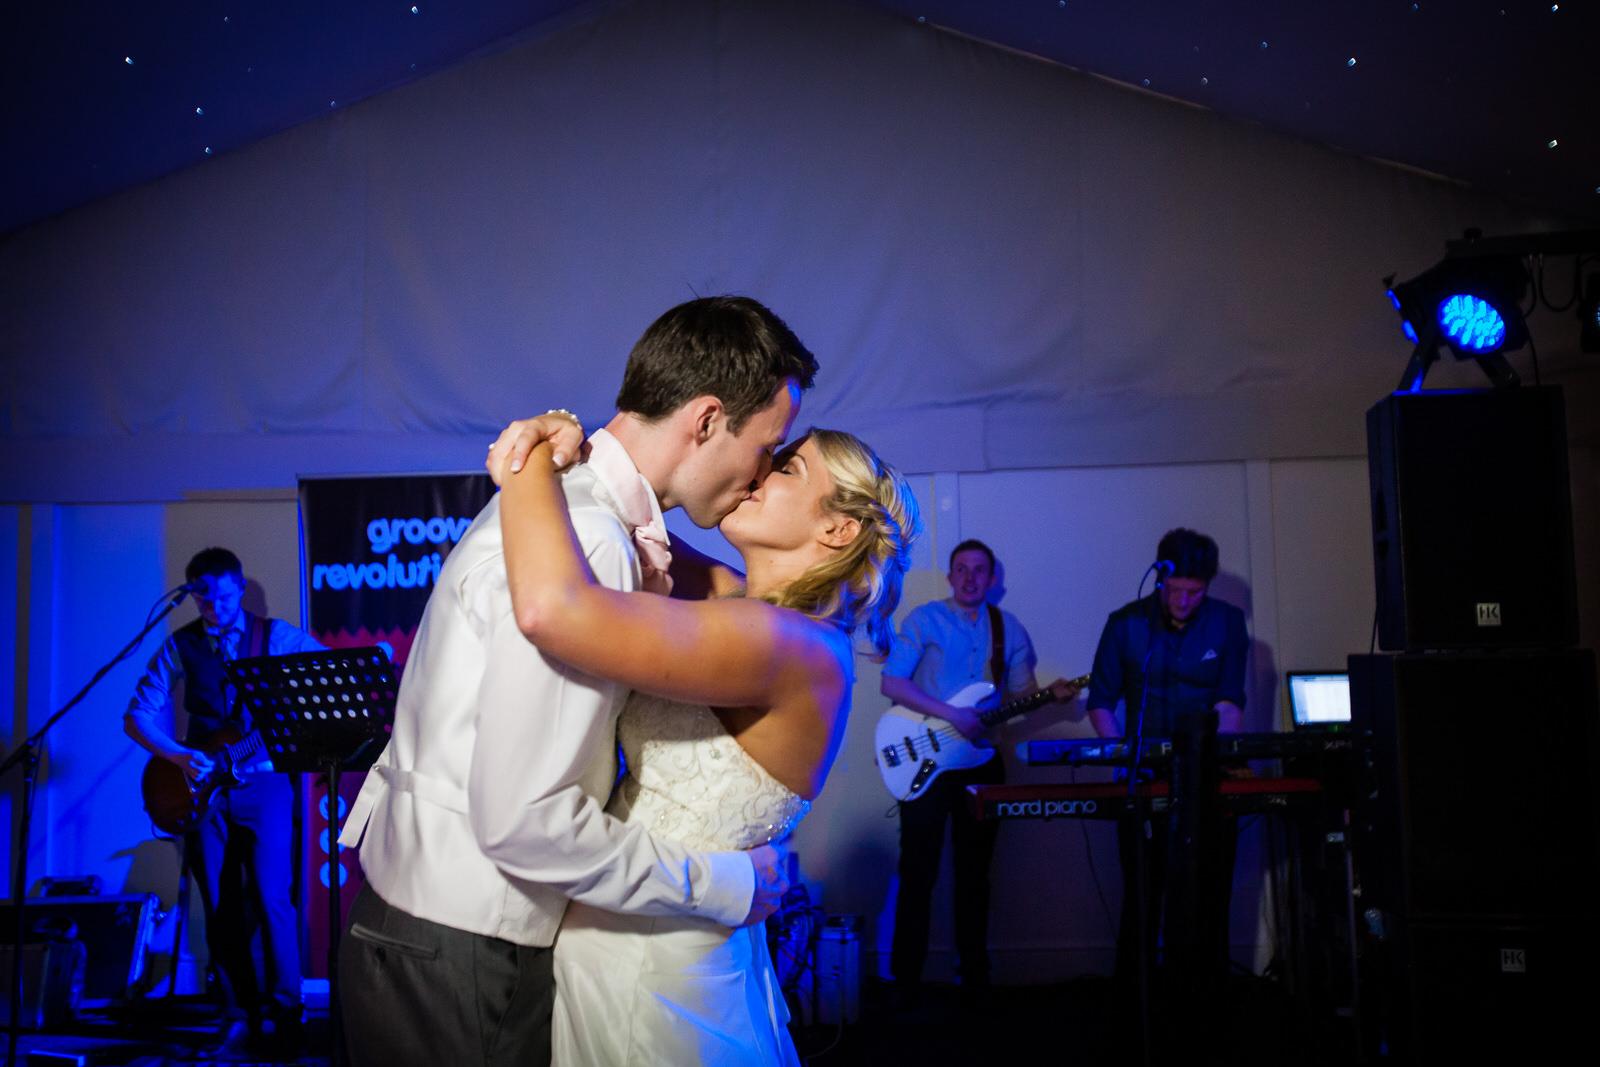 groovy revolution, combermere abbey wedding - shropshire wedding supplier